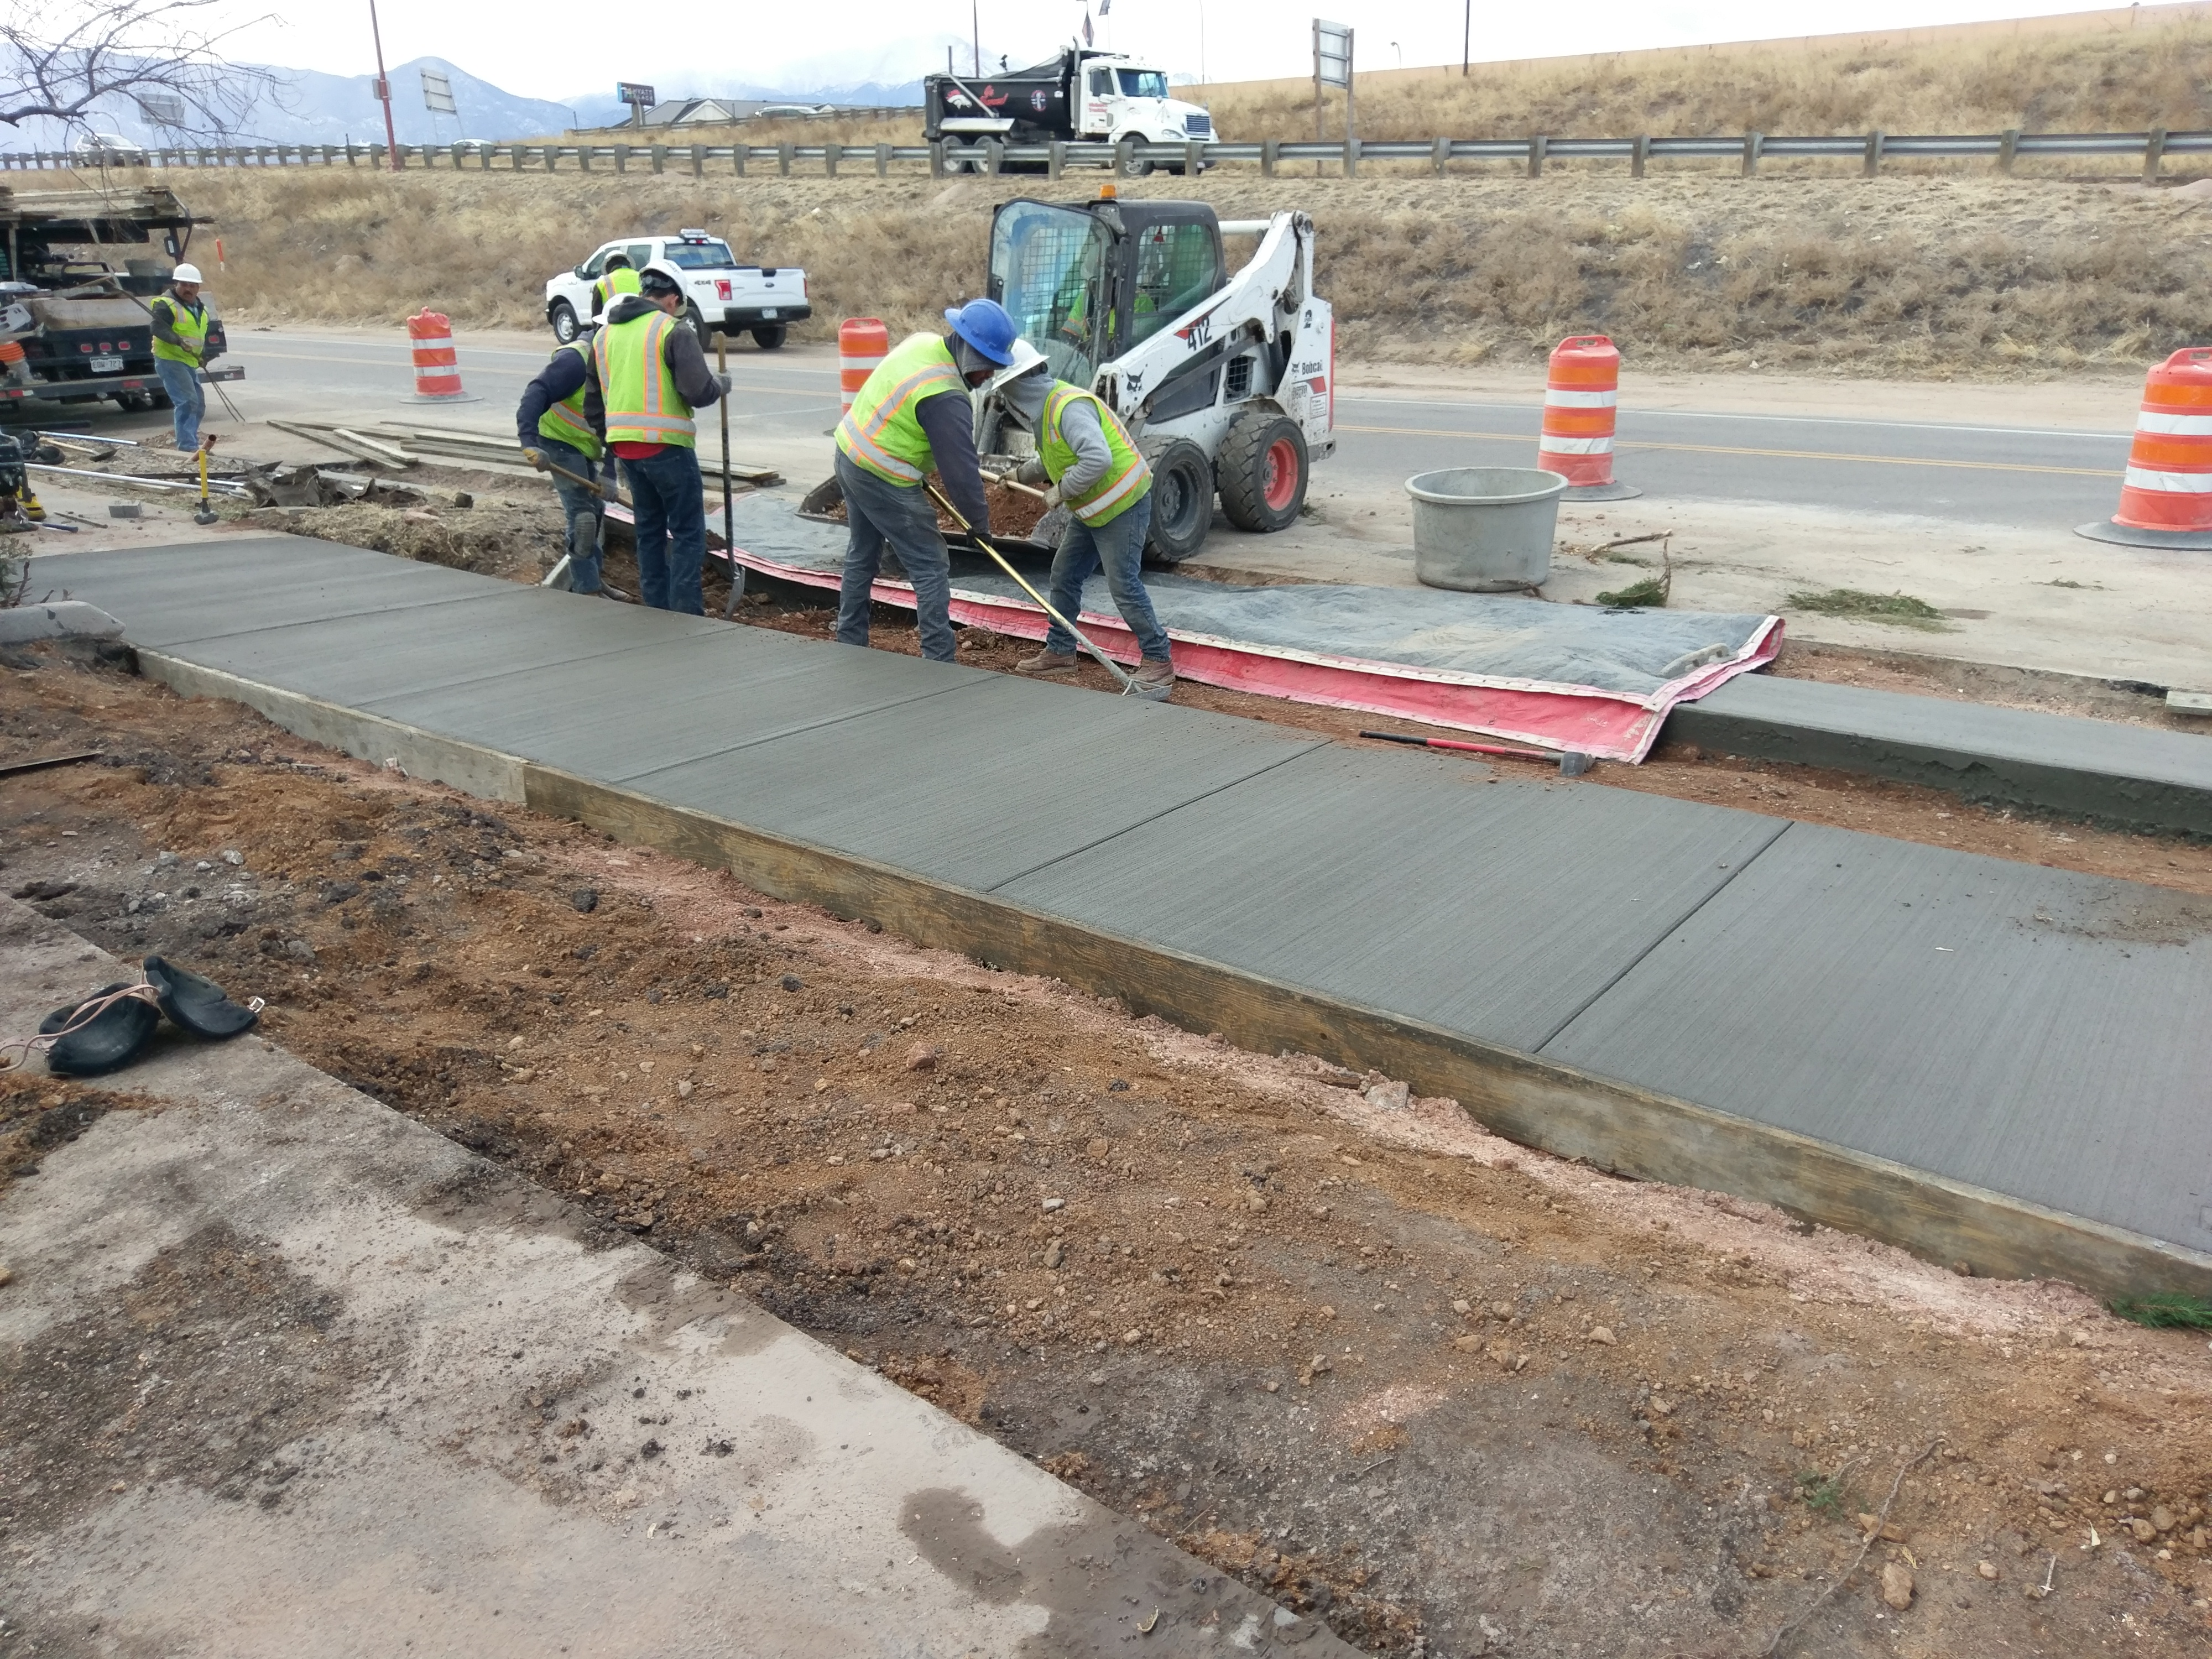 Road construction work on Sinton Road